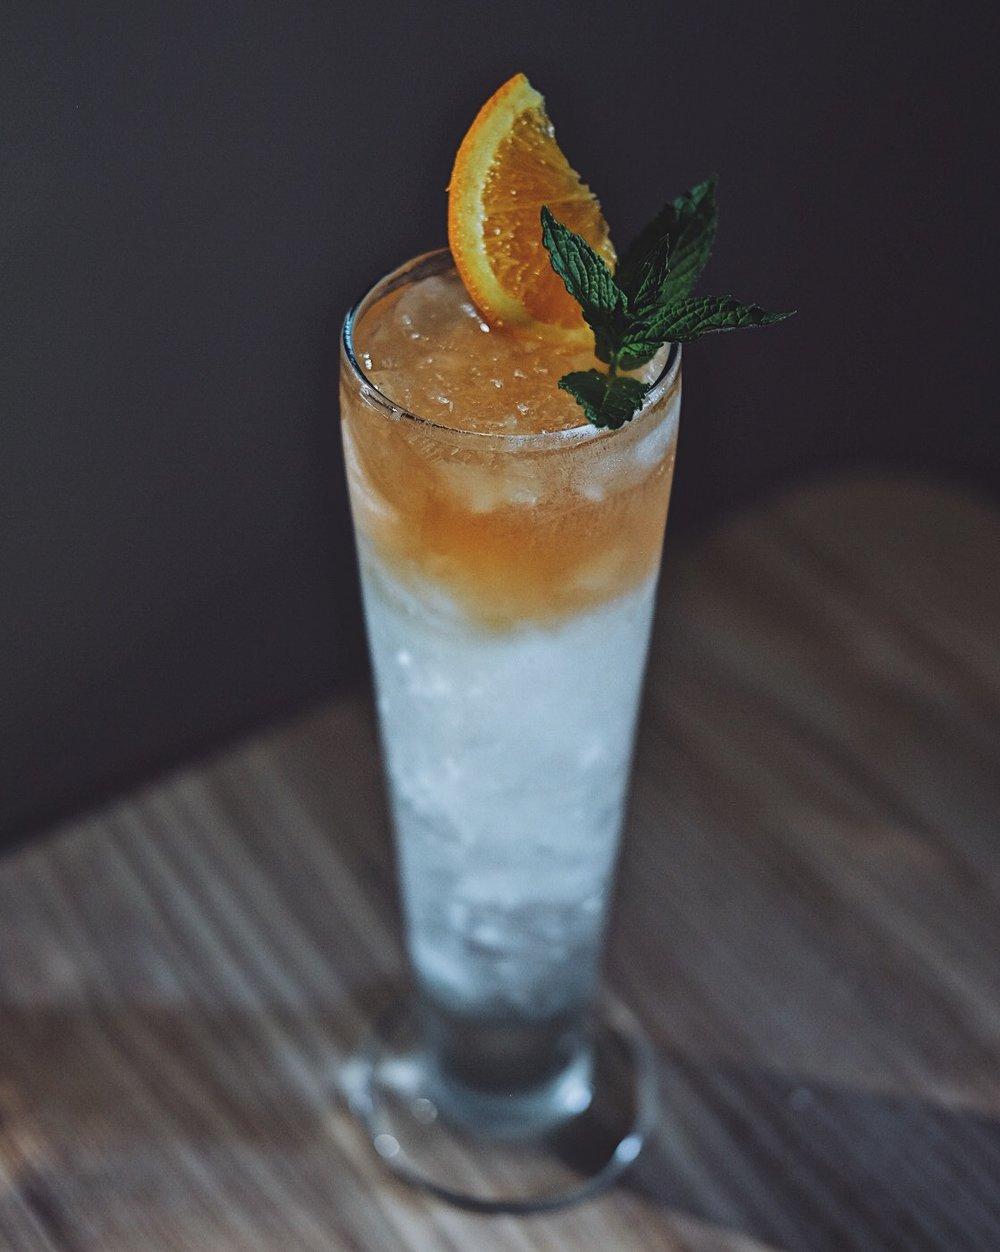 ingredients: - 1 oz bourbon1oz dry gin1/2 oz fresh lime juice1/4 oz Demerara syrup2 dashes aromatic bitters4 oz ginger beerGarnish: Fresh mint & orange wheel